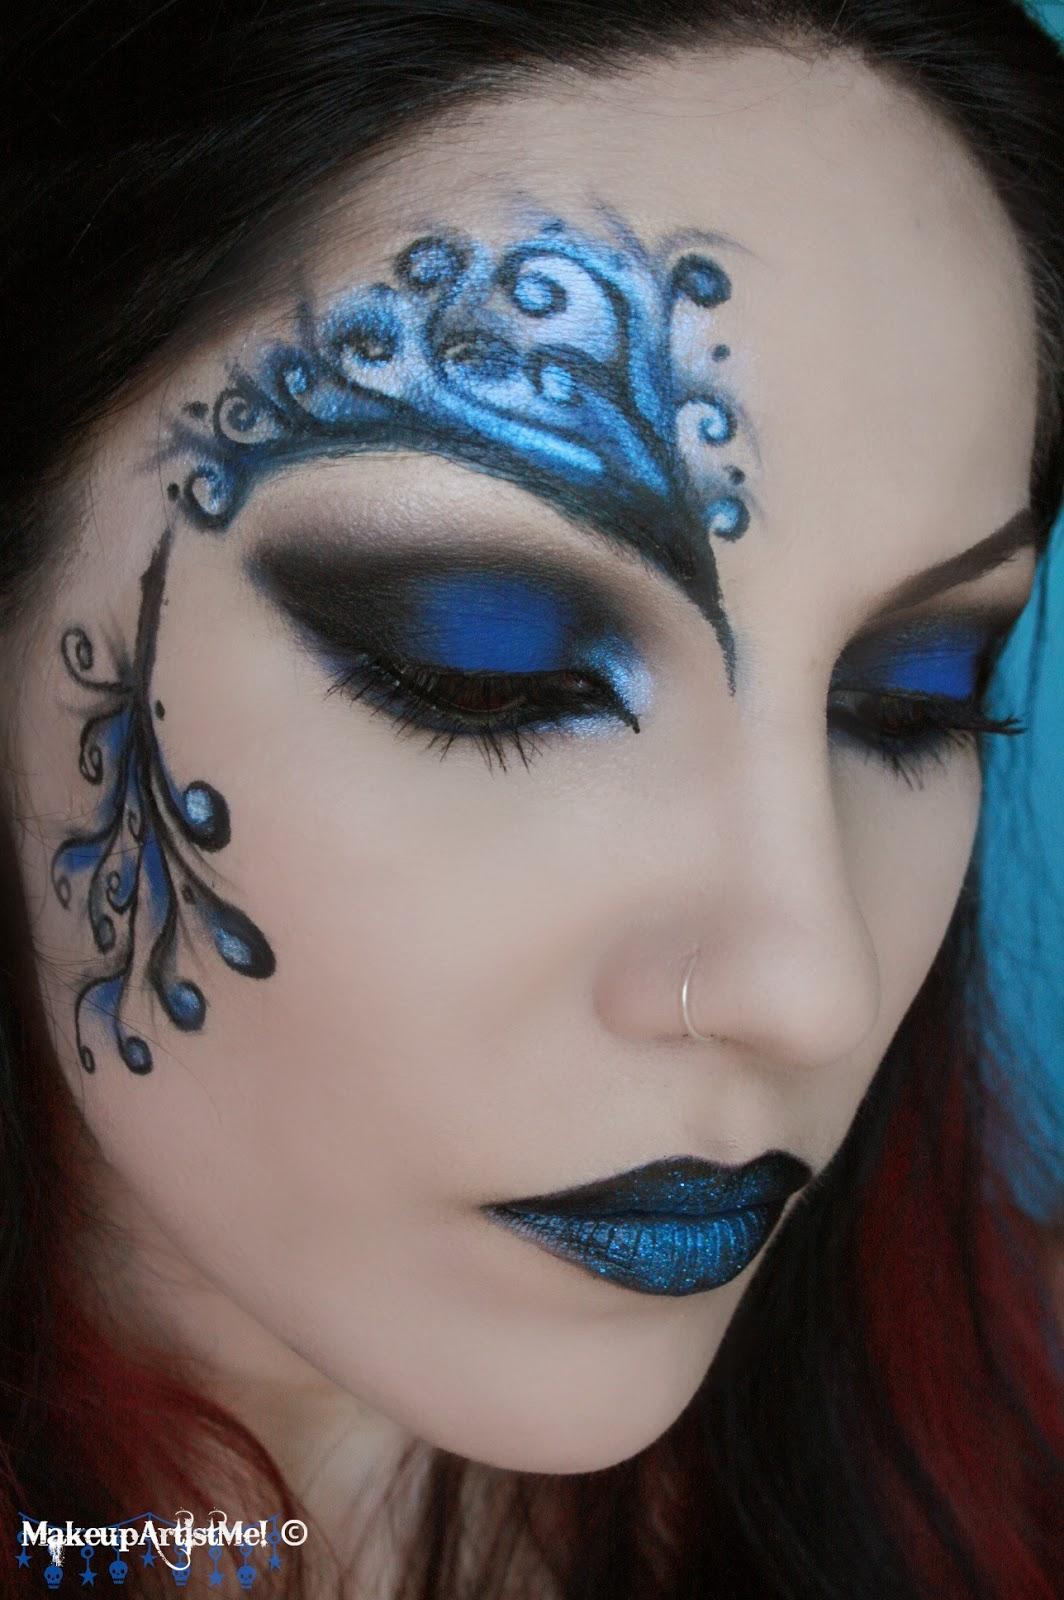 Make-up Artist Me!: Blue Secret- Blue Masquerade Makeup